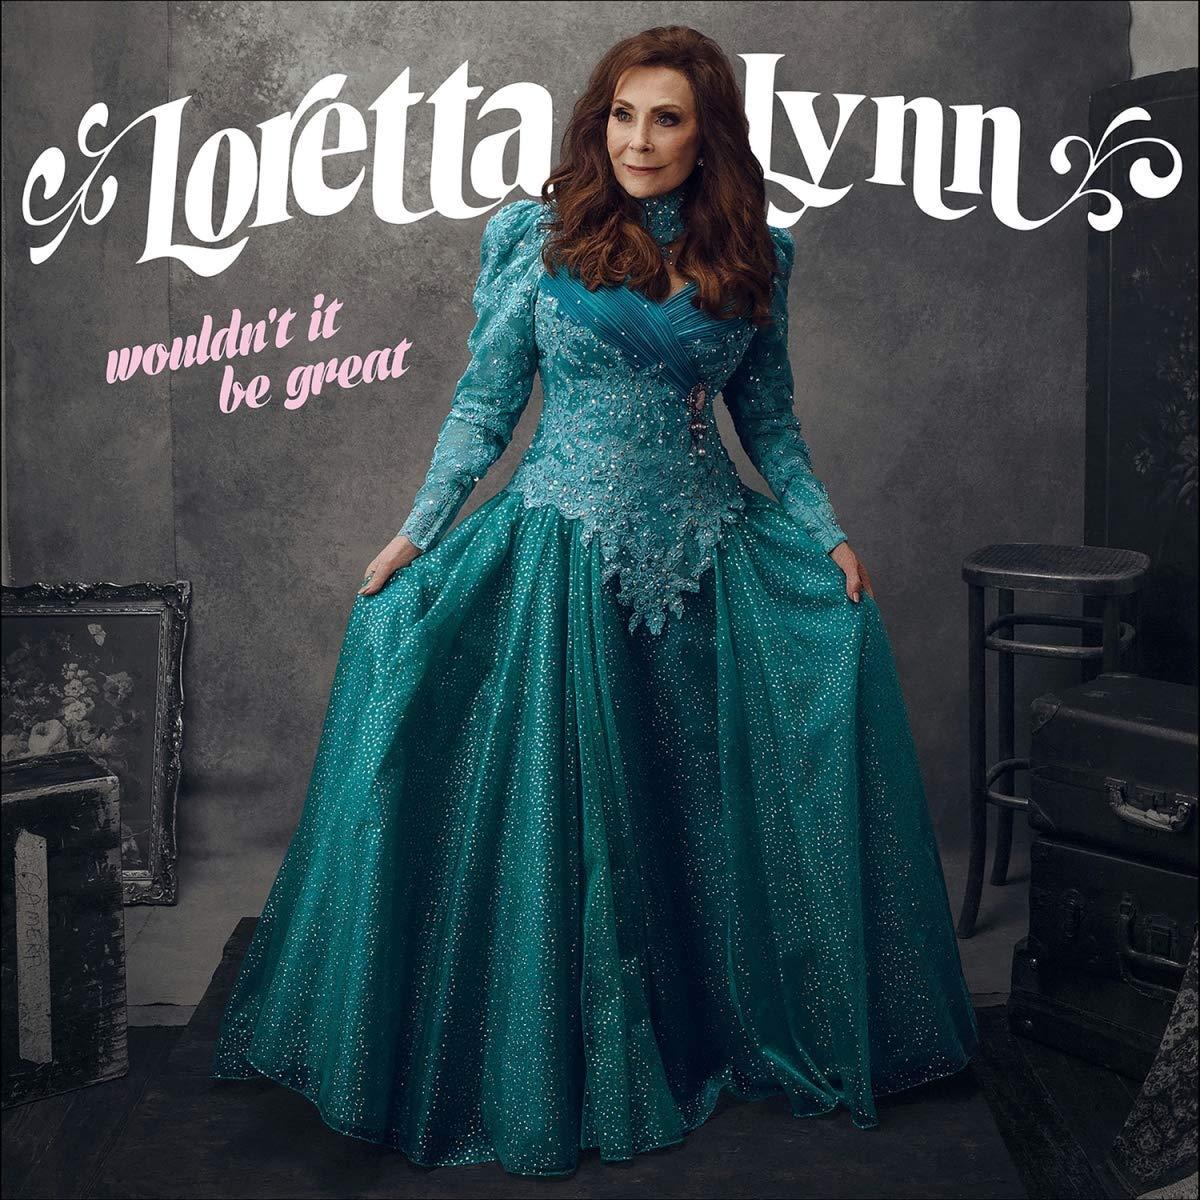 Лоретта Линн Loretta Lynn. Wouldn't It Be Great (LP)